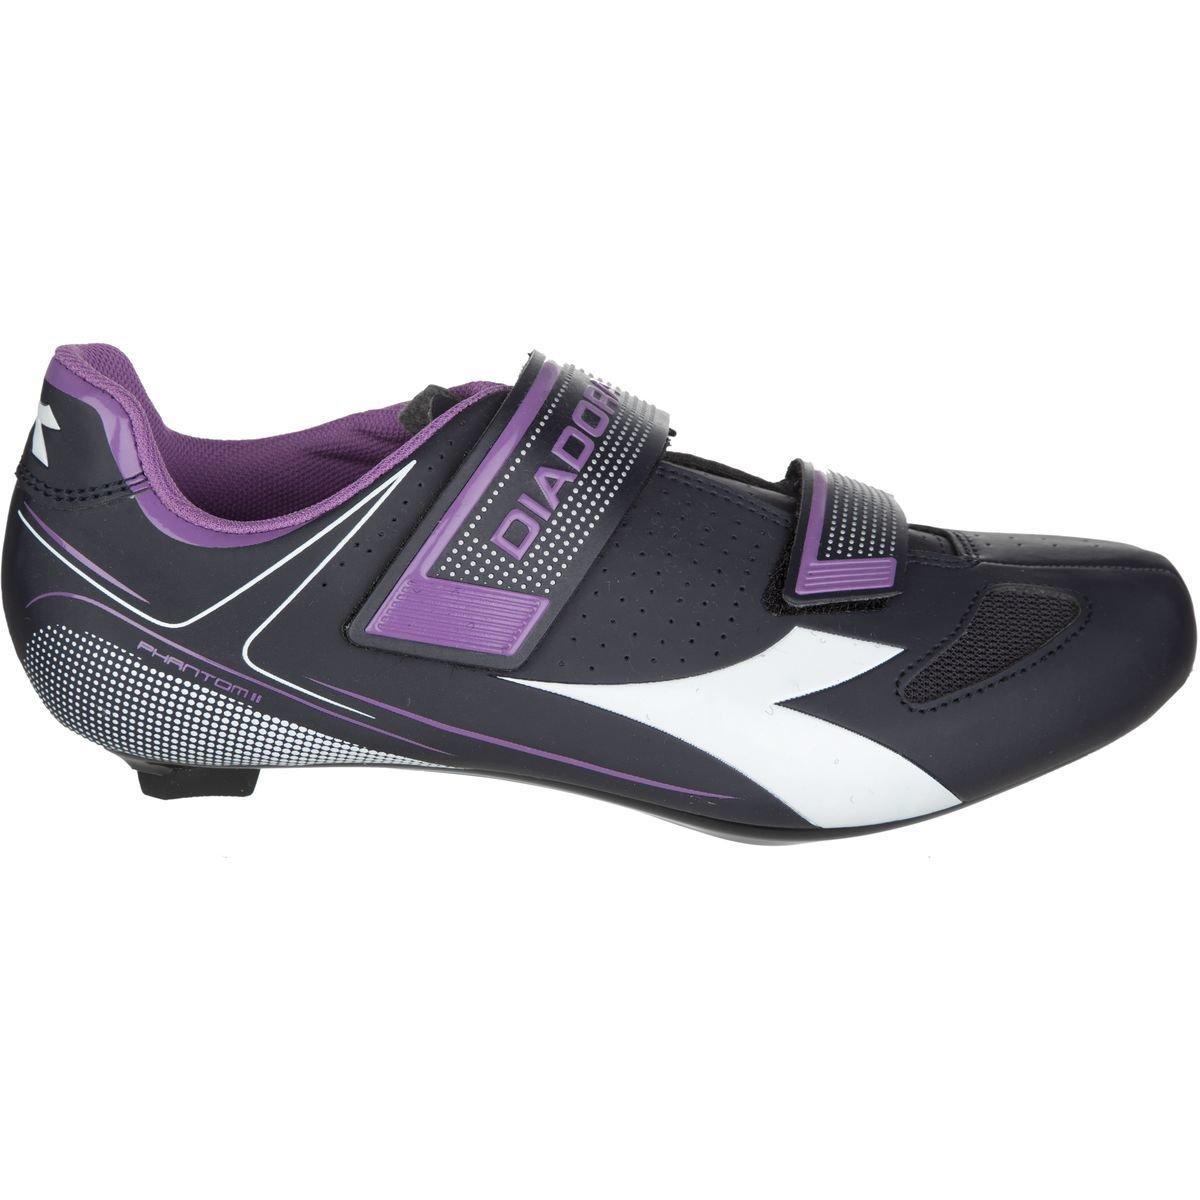 Diadora Phantom II Cycling Shoes - Women's Dk Smoke/White/Violet Orchid Iris, 41.0